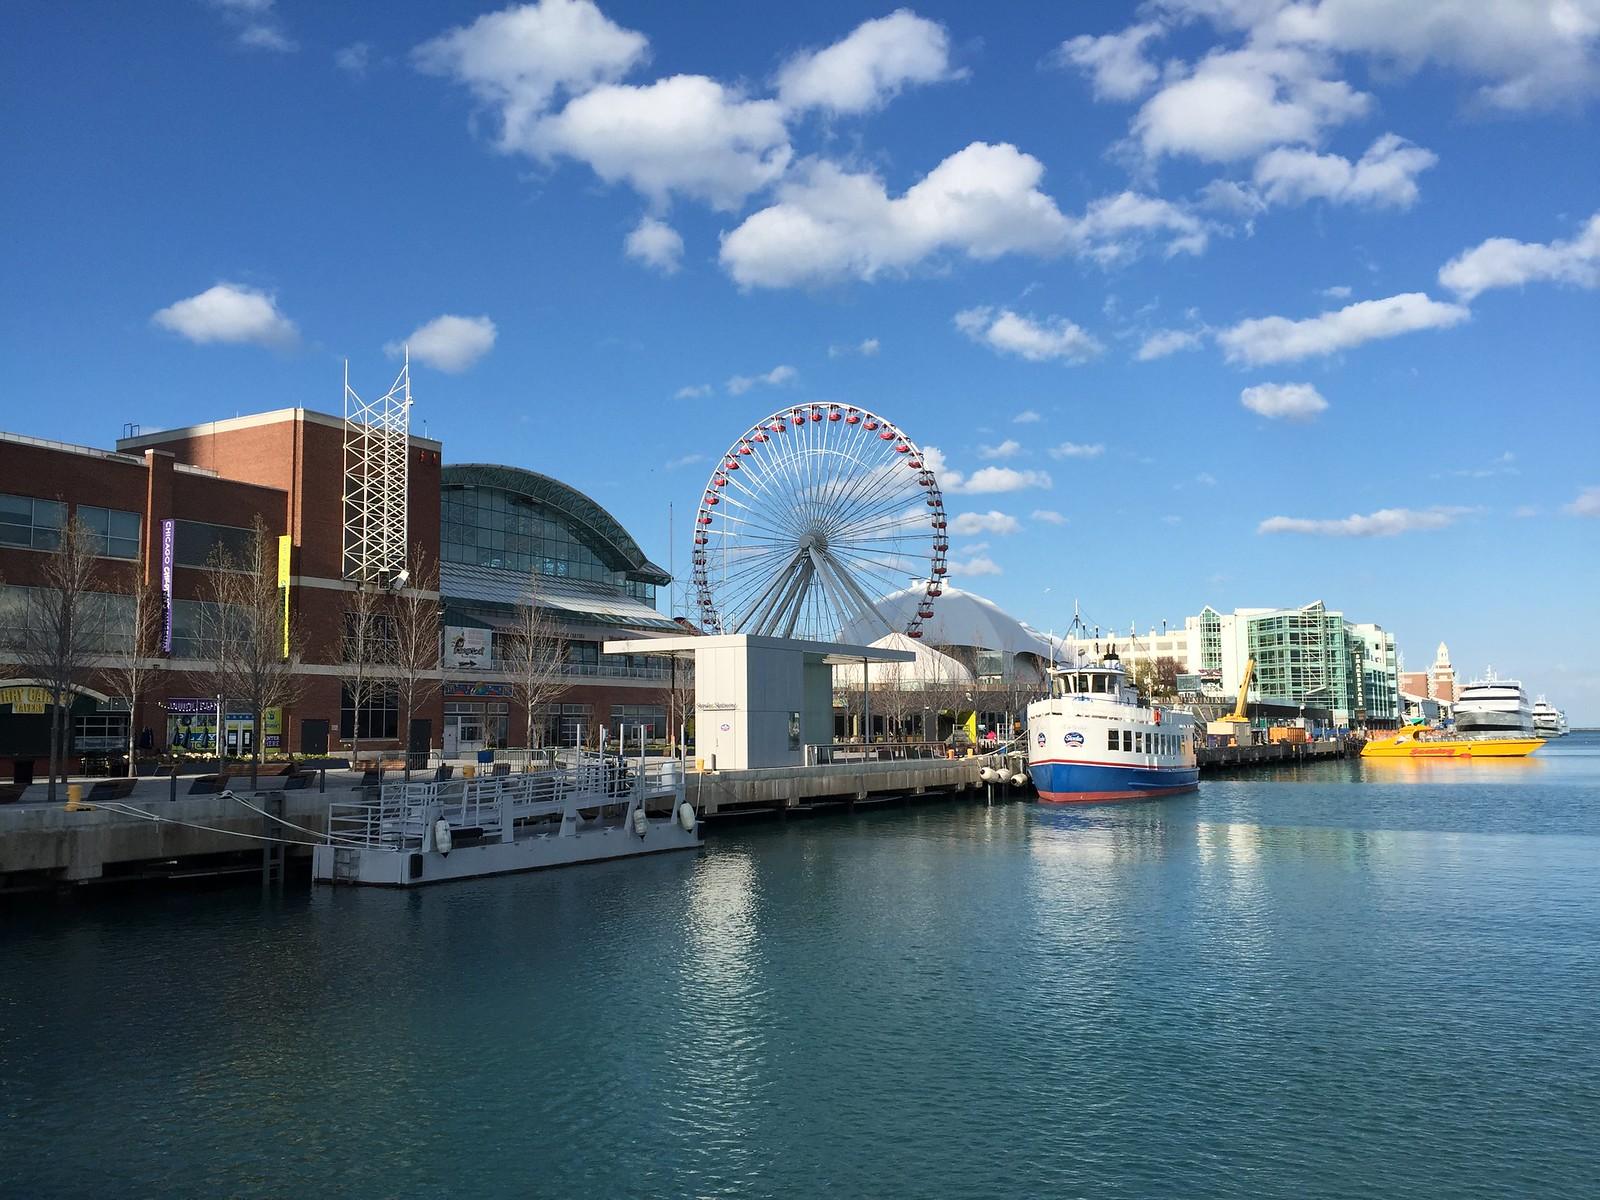 Navy Pier 21-04-2015 17-34-29